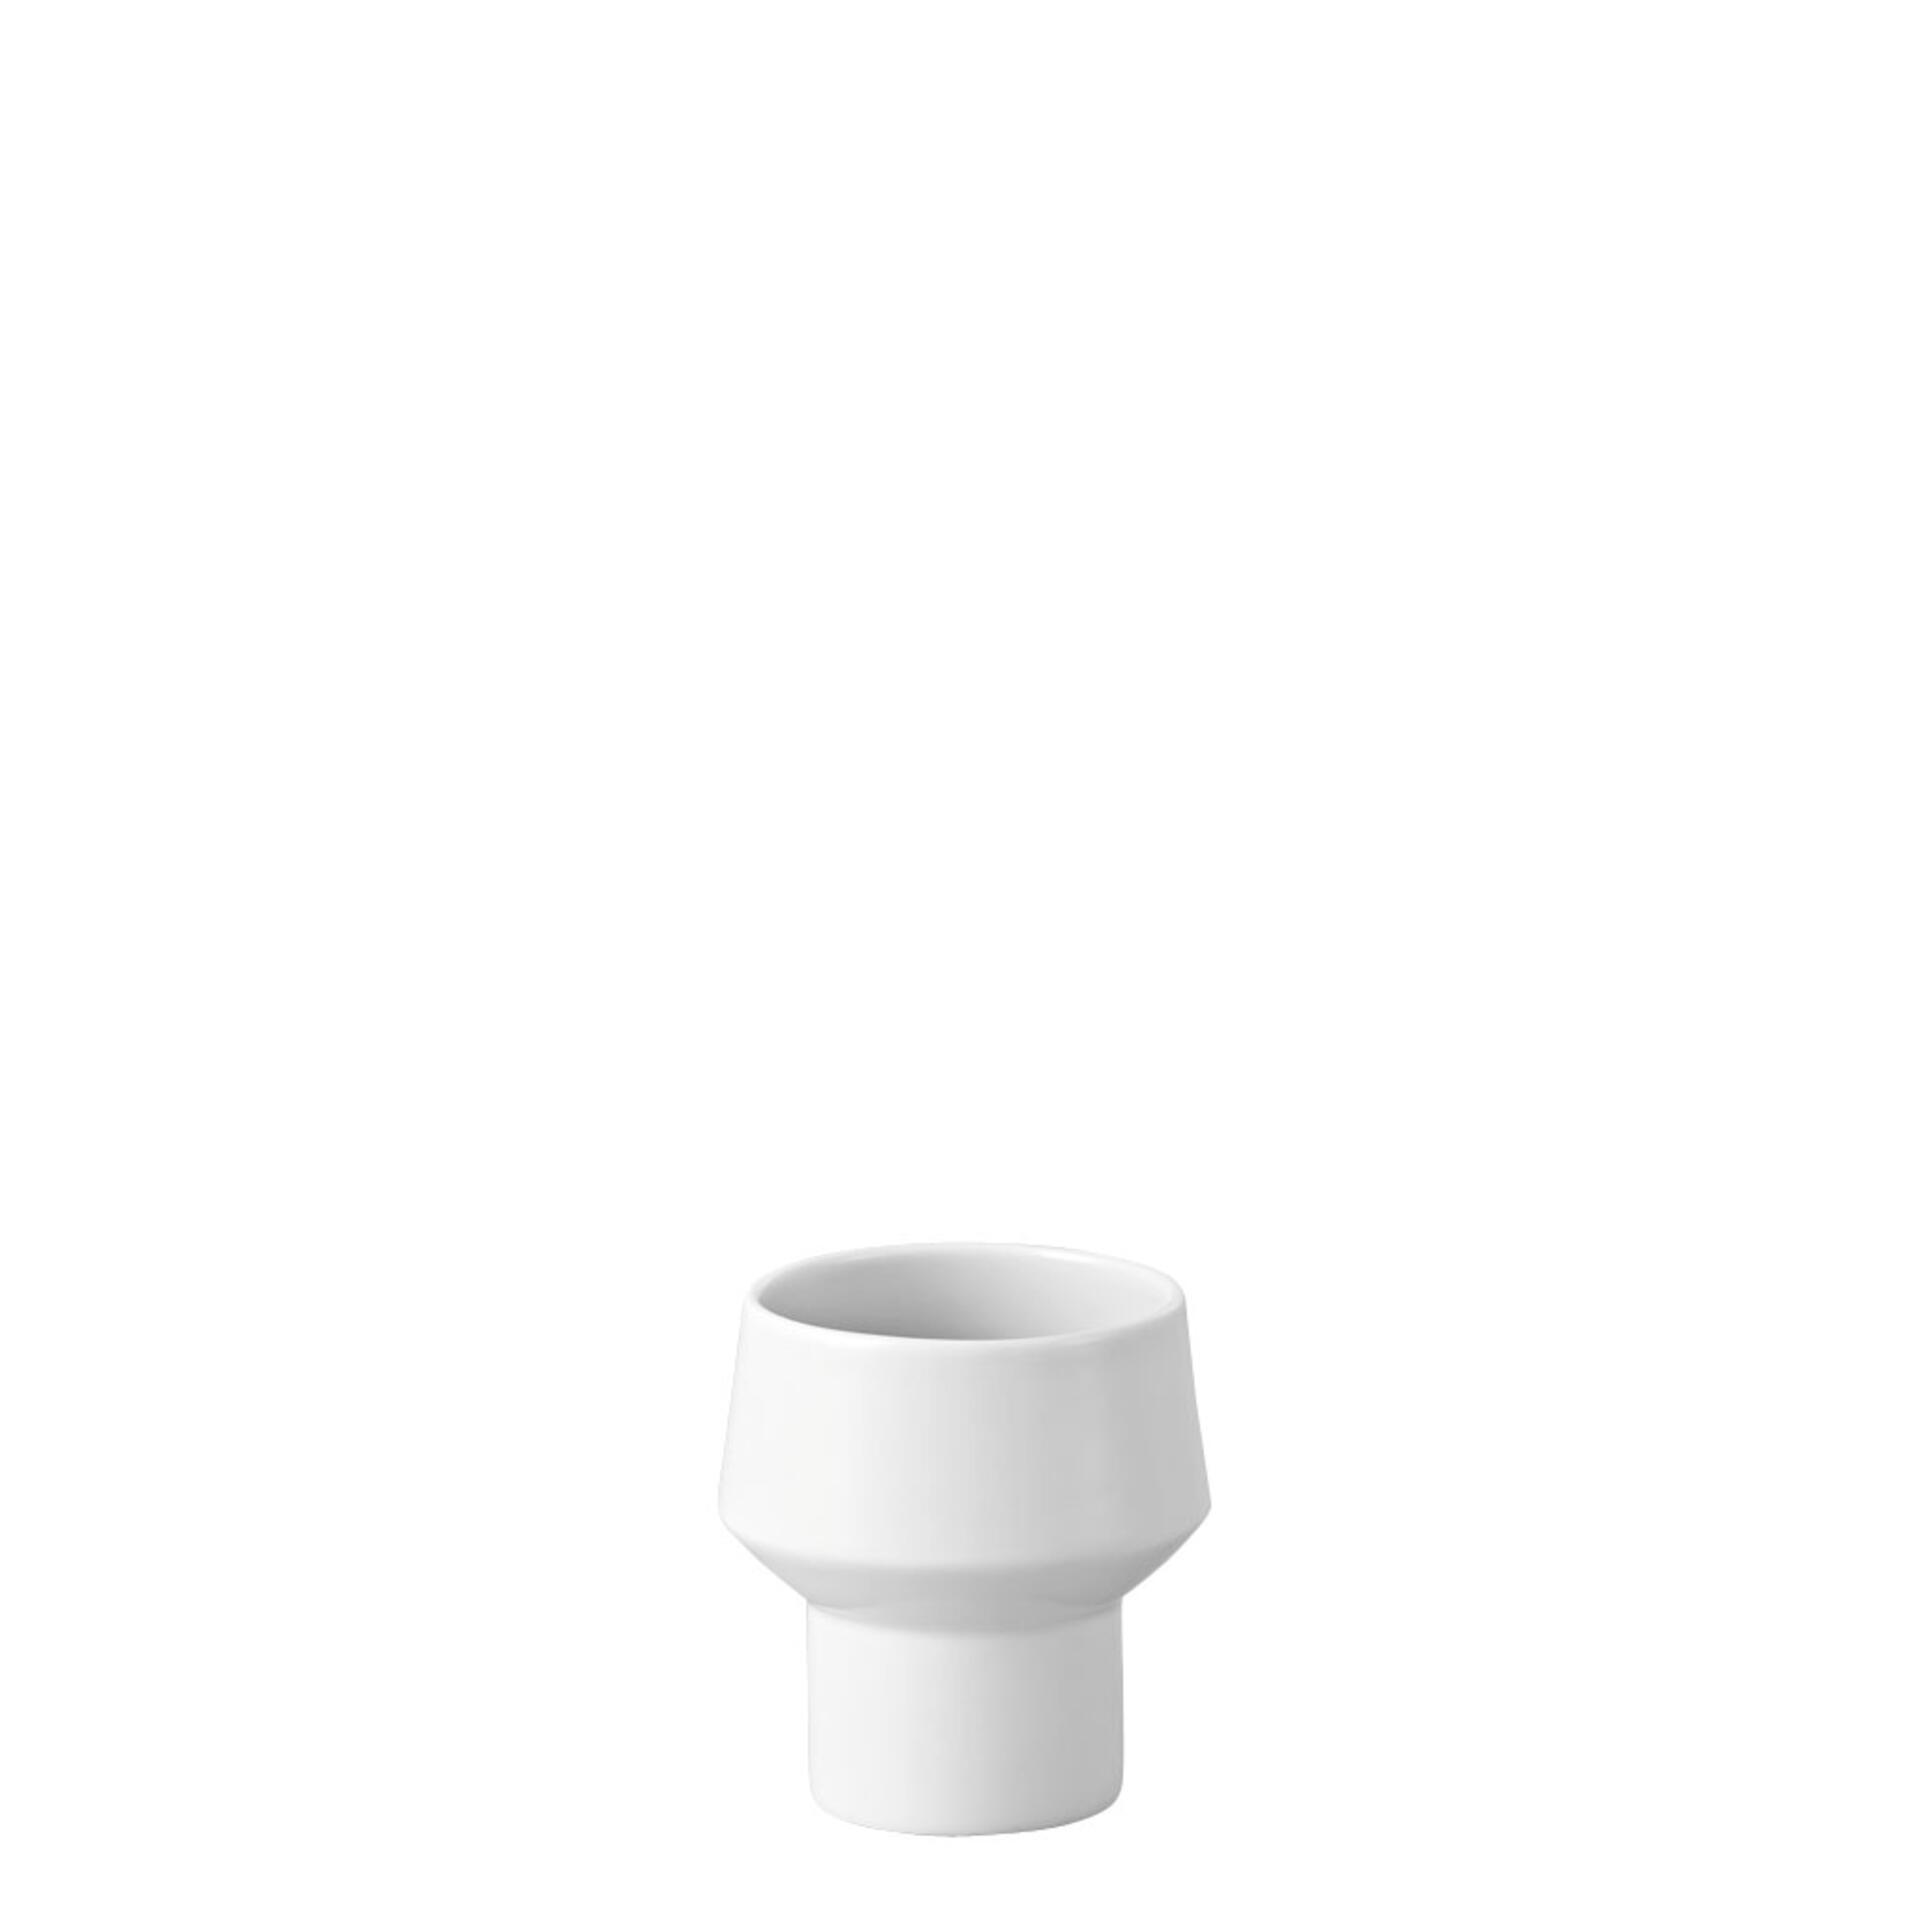 Rosenthal Vase Studio-Line Format 8 cm